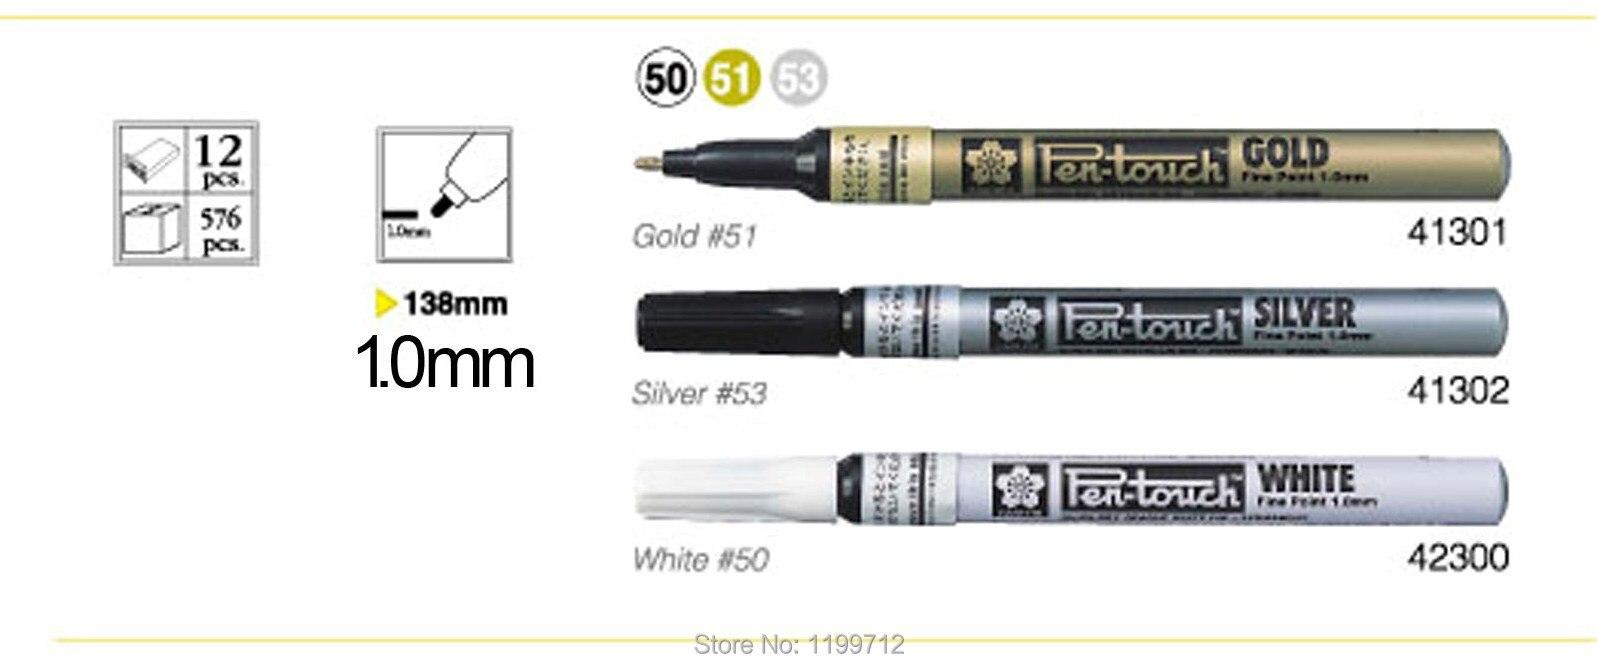 Sakura Pen Touch Paint Marker Silver,Gold,White extra Fine set of 3 New!